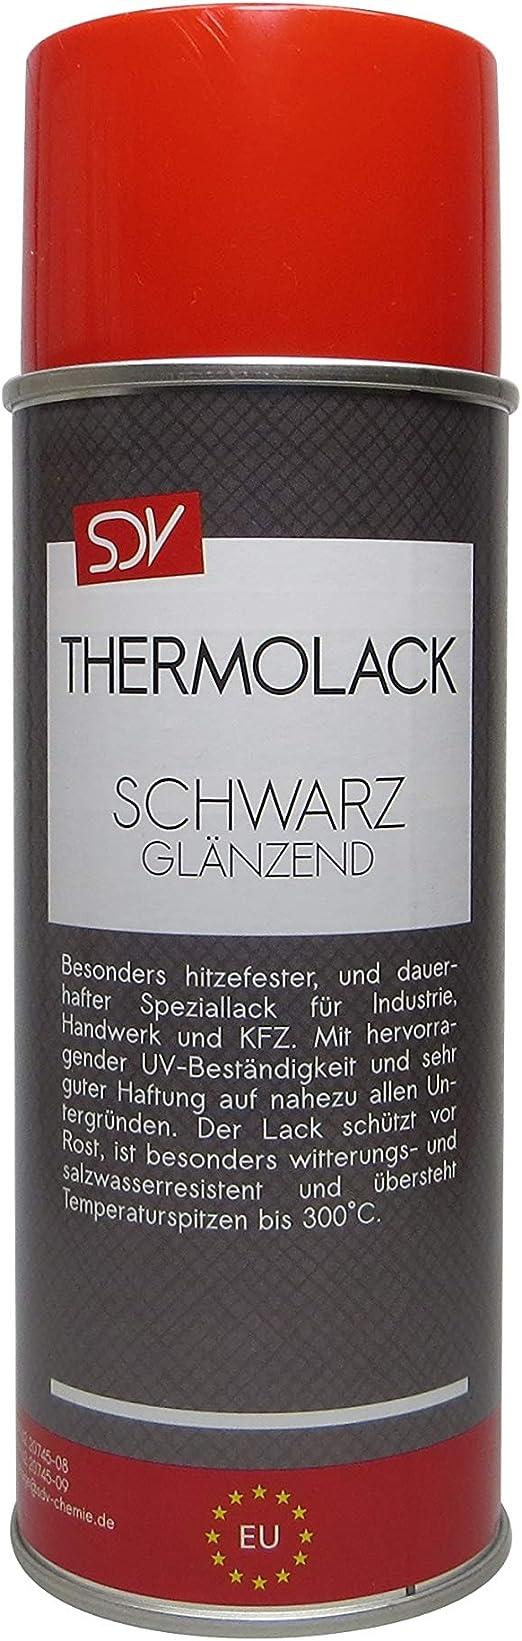 Sdv Chemie Thermolack Spray Schwarz Glänzend Bis 300 C 1x 400ml Auspufflack Ofenlack Motorlack Grill Lack Auto